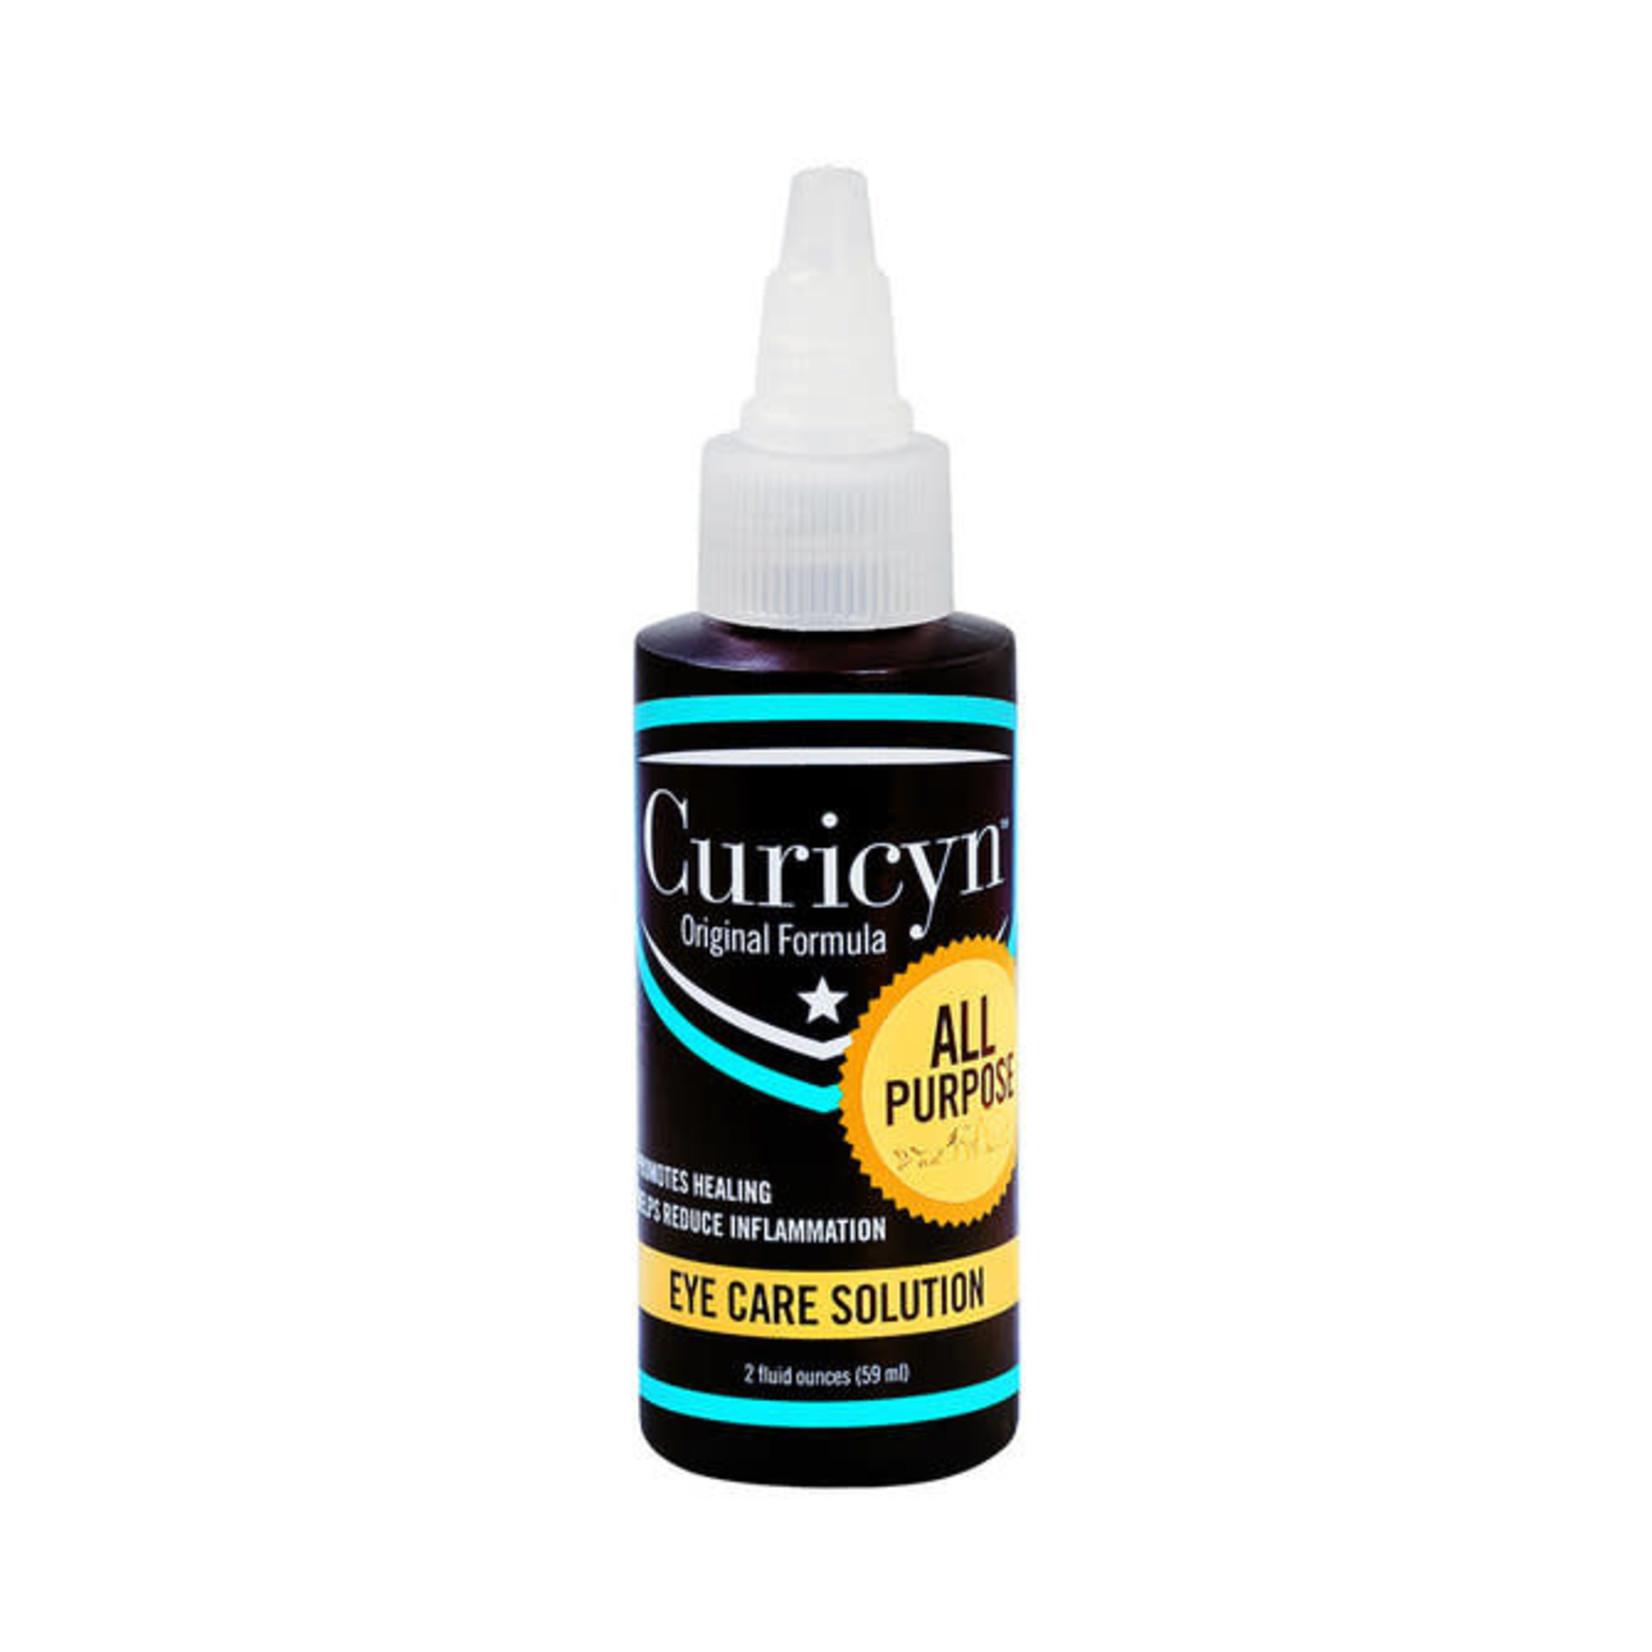 Curicyn Eye Care Solution